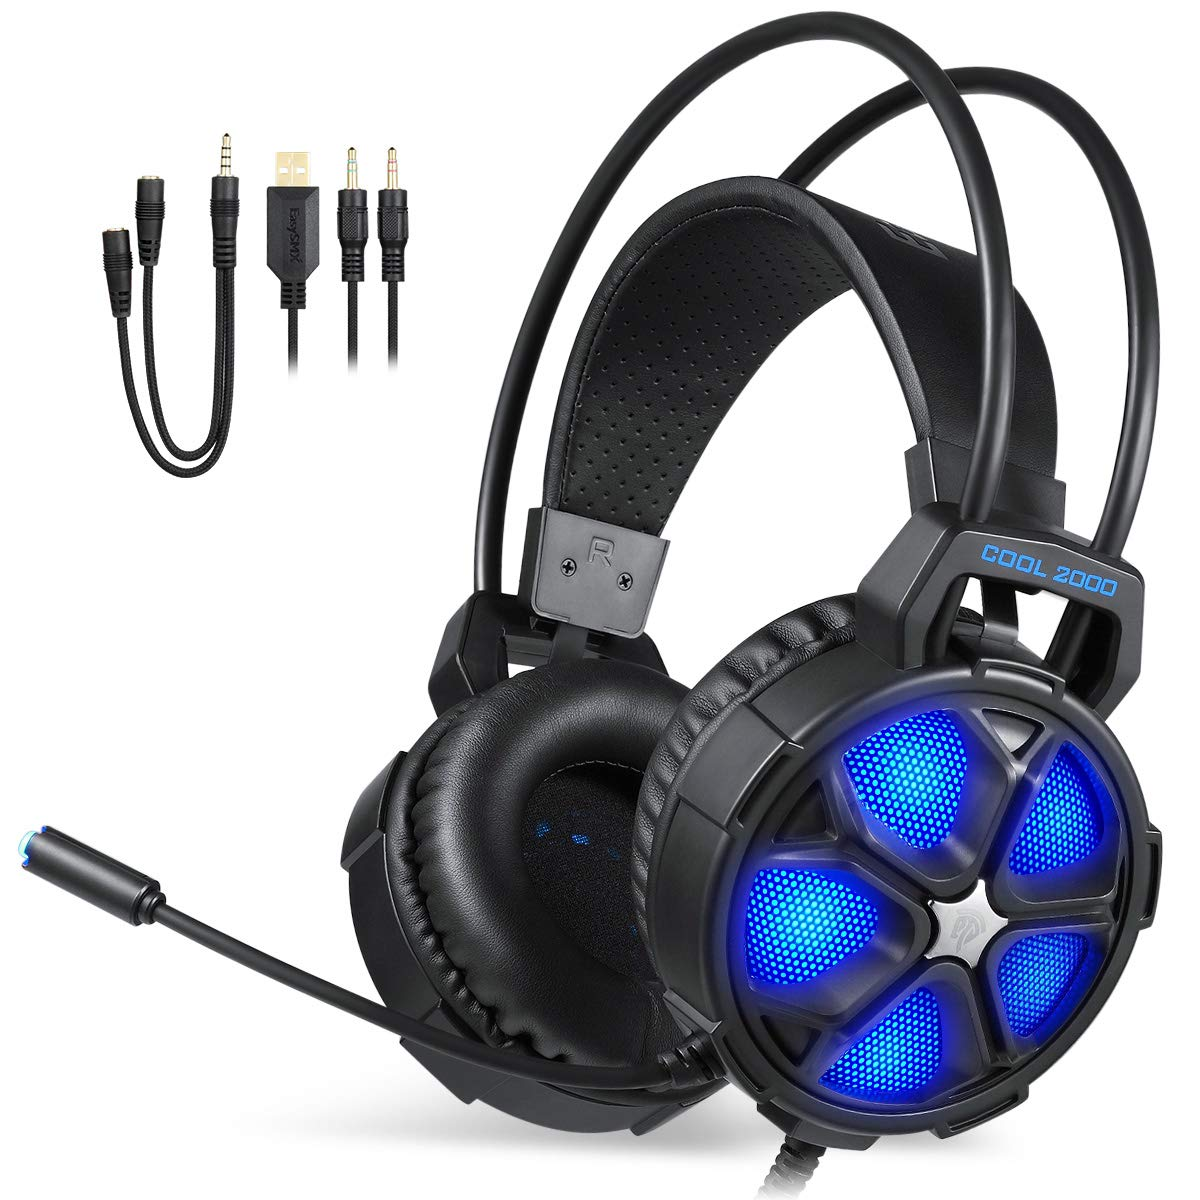 EasySMX Cascos Gaming, Auriculares Gaming con Micrófonos, Auriculares Stereo con Control de Volumen, Cable 2 en 1 y Iluminación LED, Compatible con PC, Mac, Xbox One, PS4, o Móvil ect.